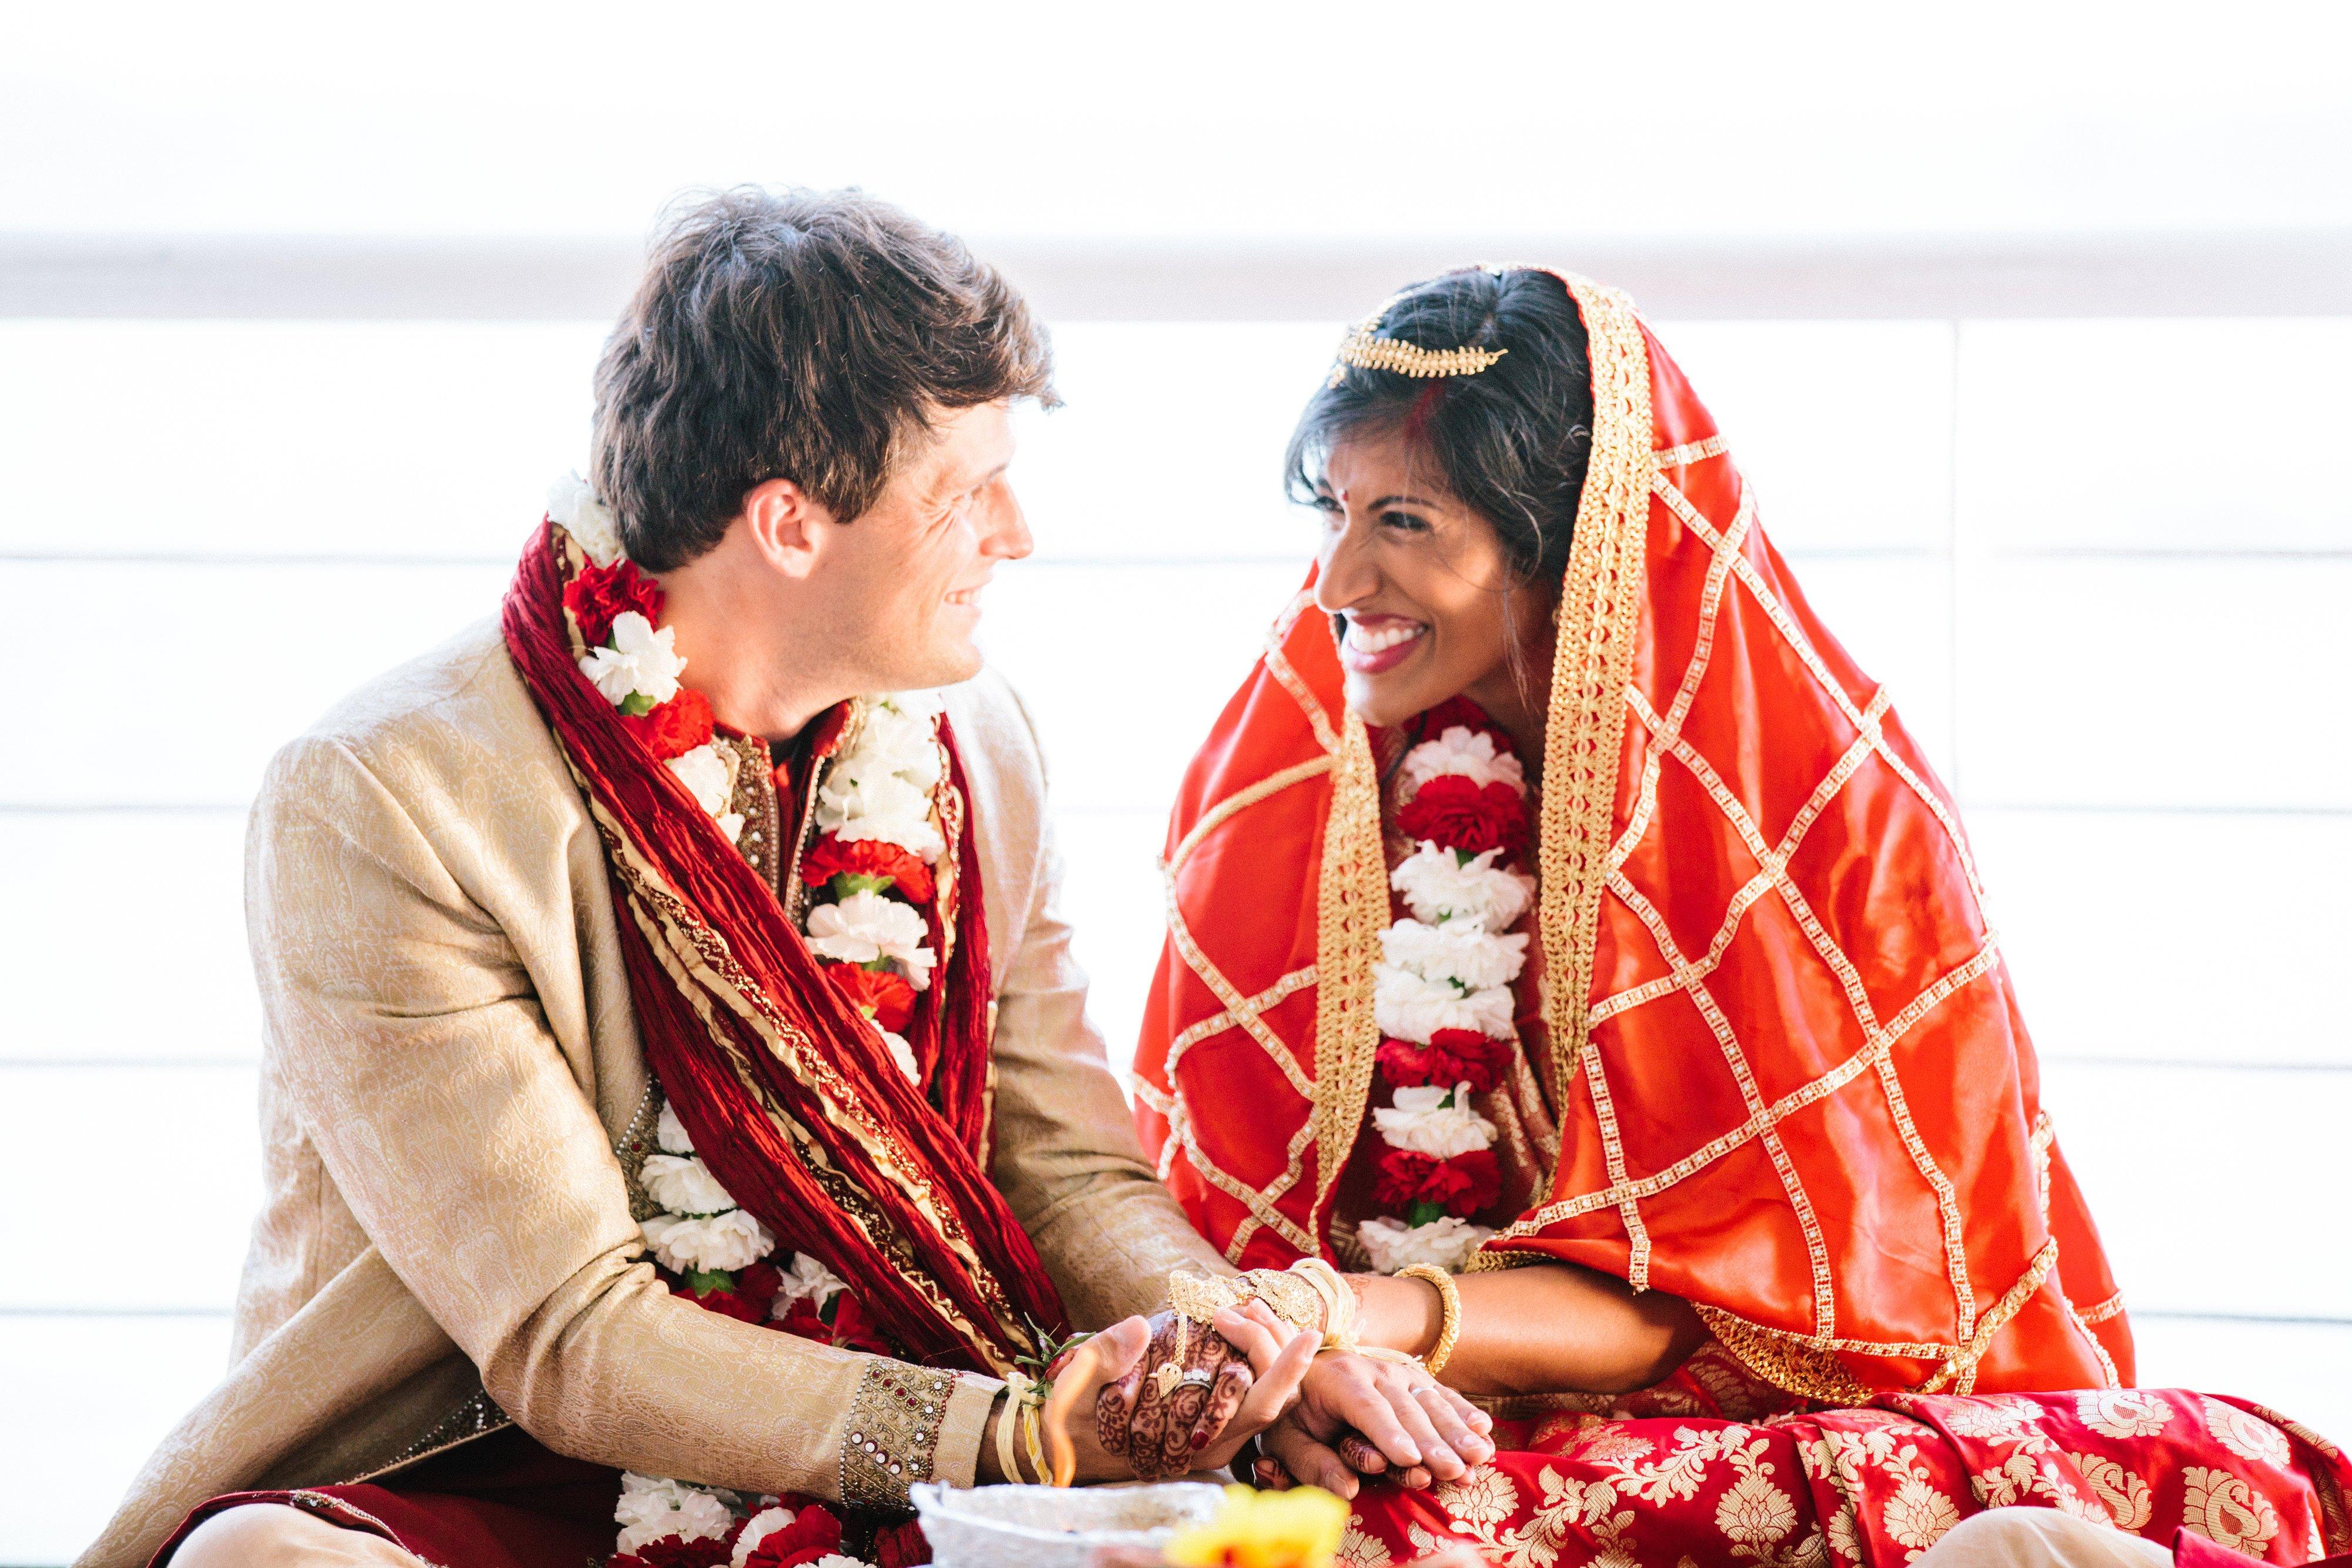 Waterfront Indian Wedding Lesner Inn Virginia Beach Trina and Greg 16.jpg